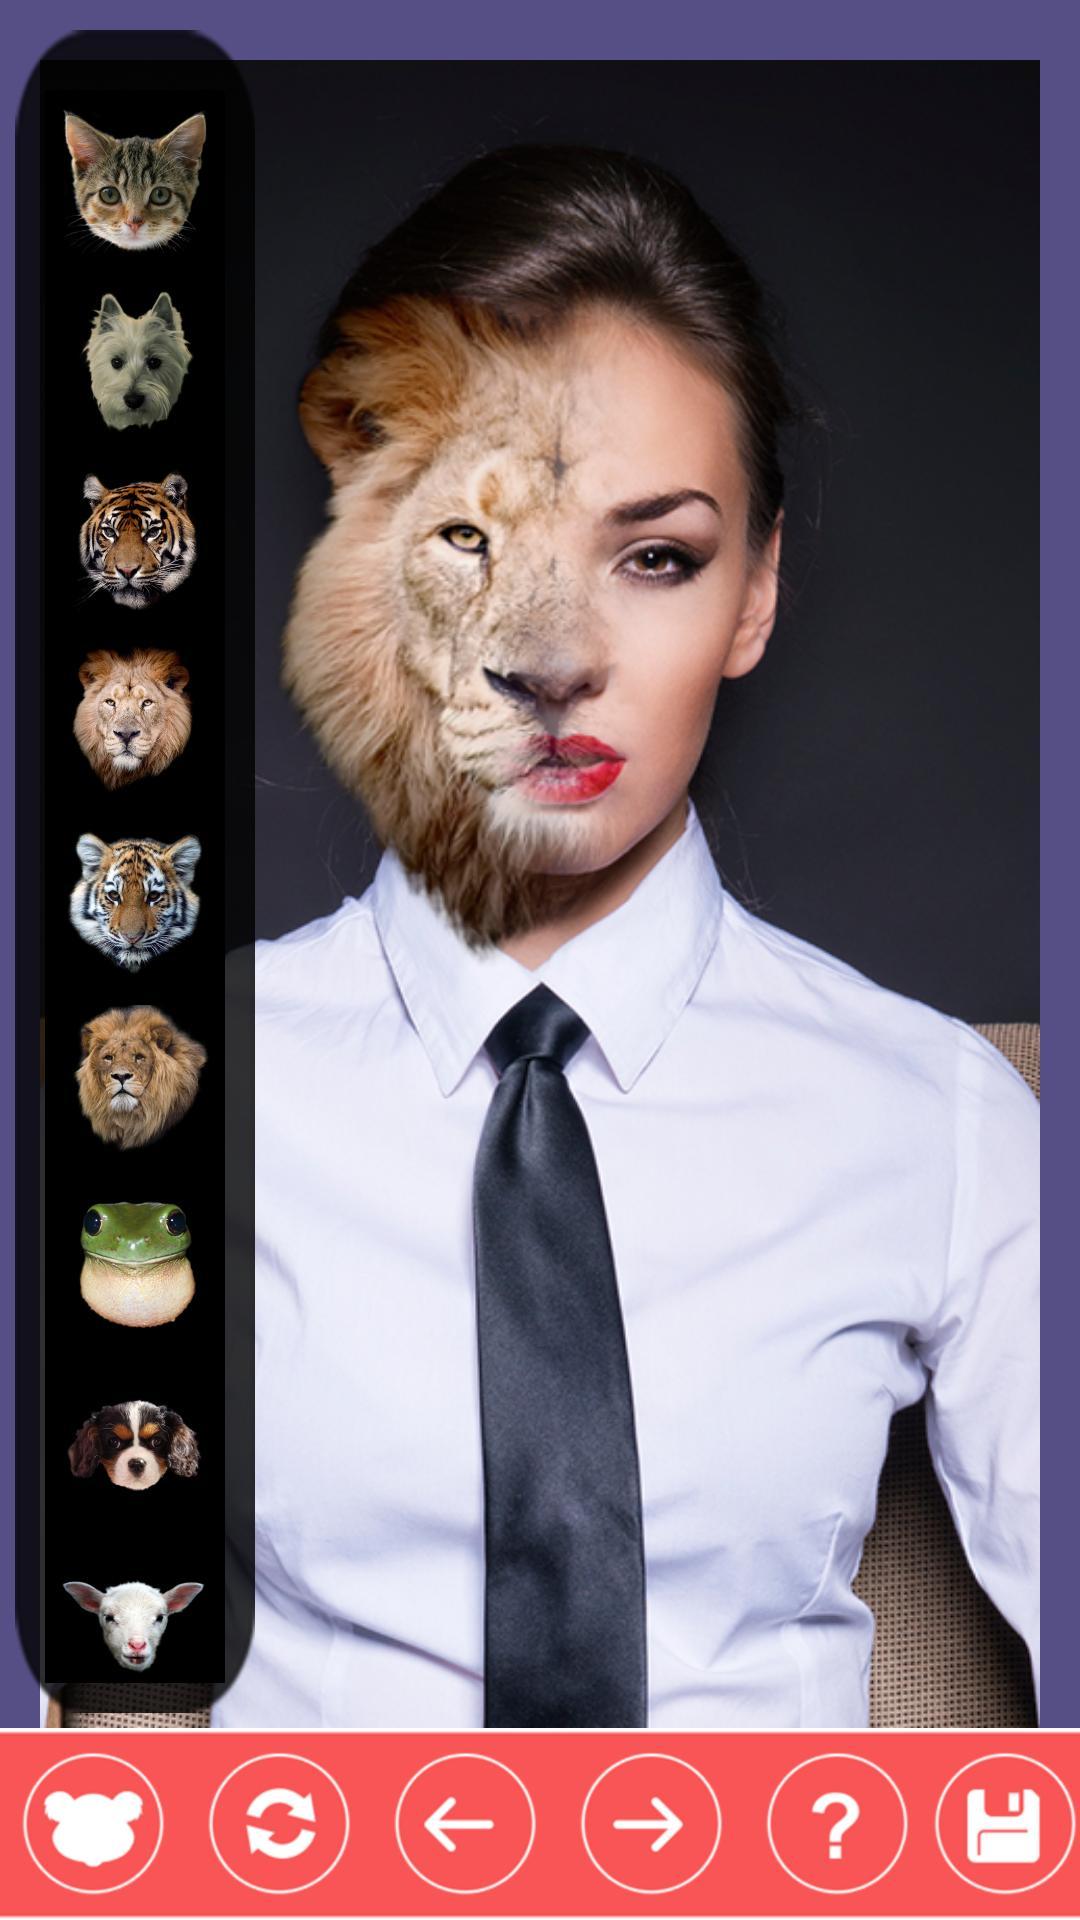 Animal Face Photo screenshot 2